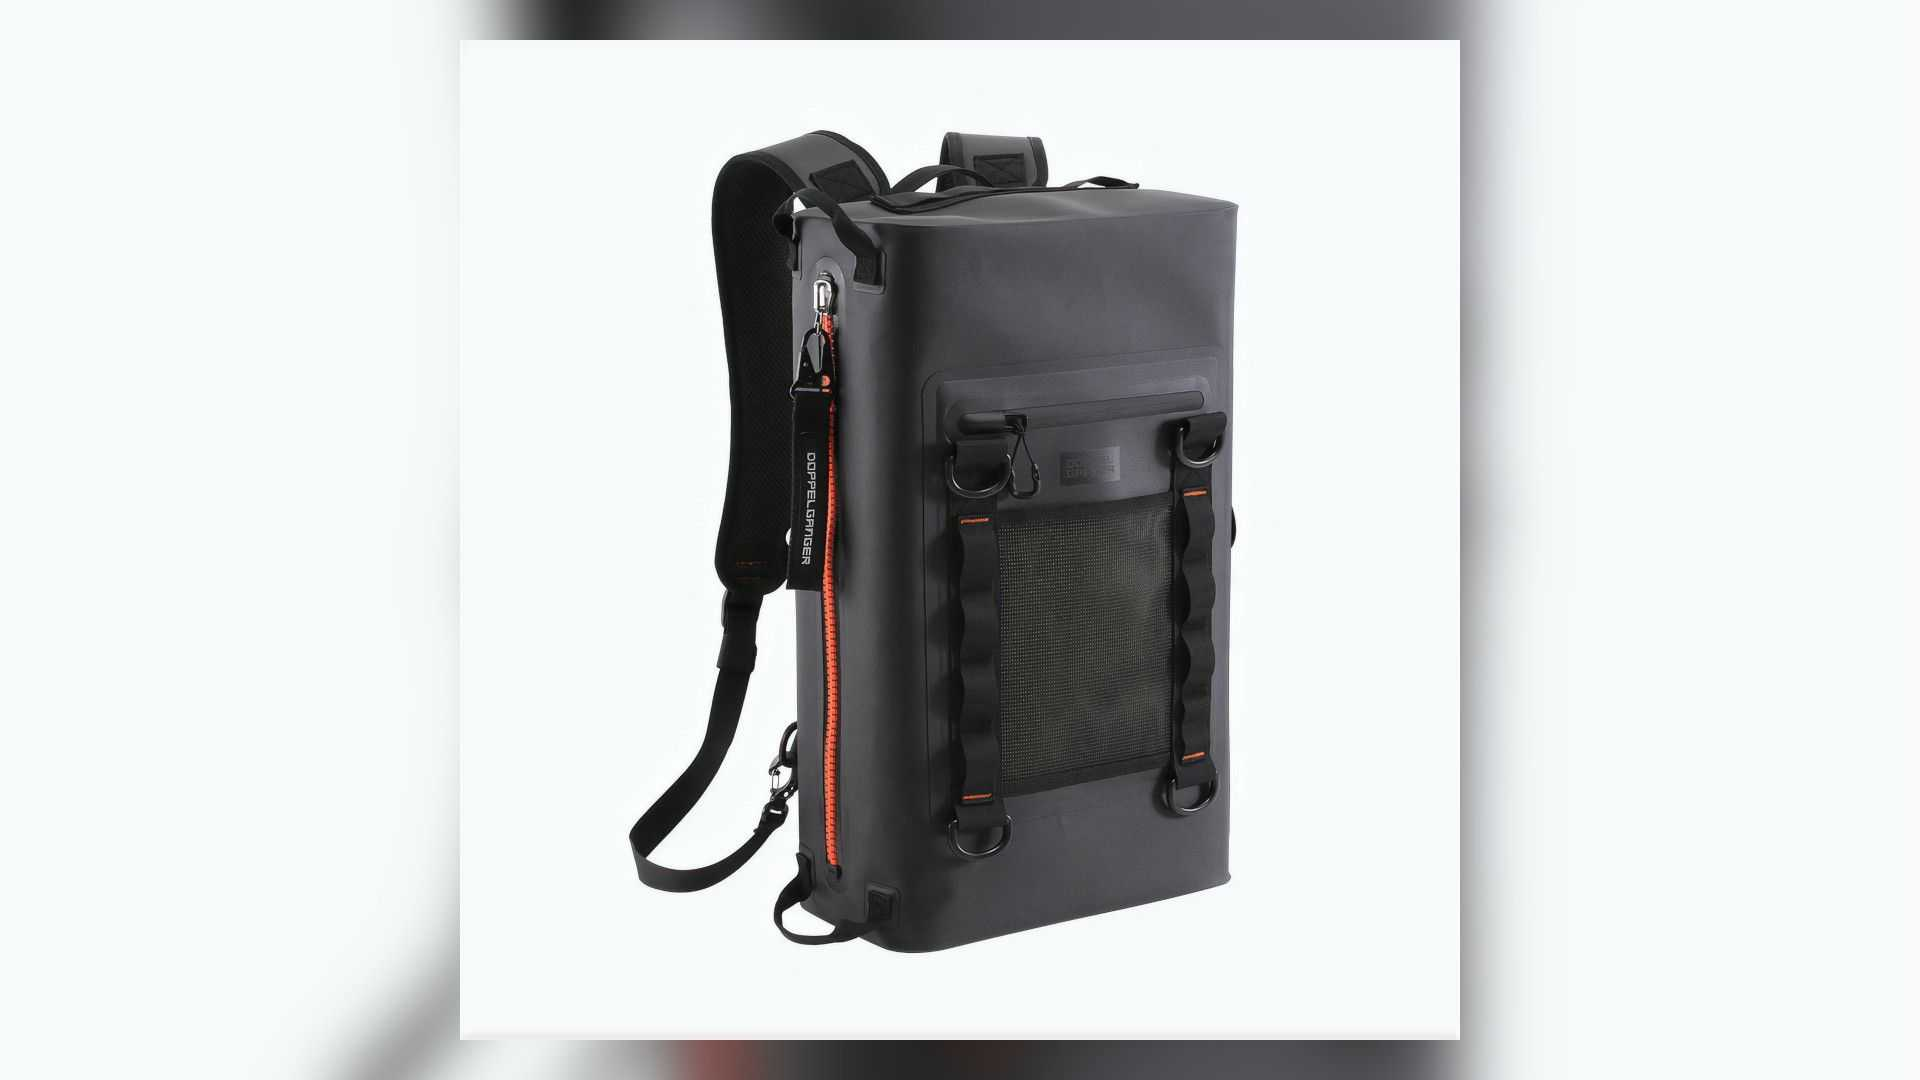 Doppelganger TPU Waterproof Backpack - Back View